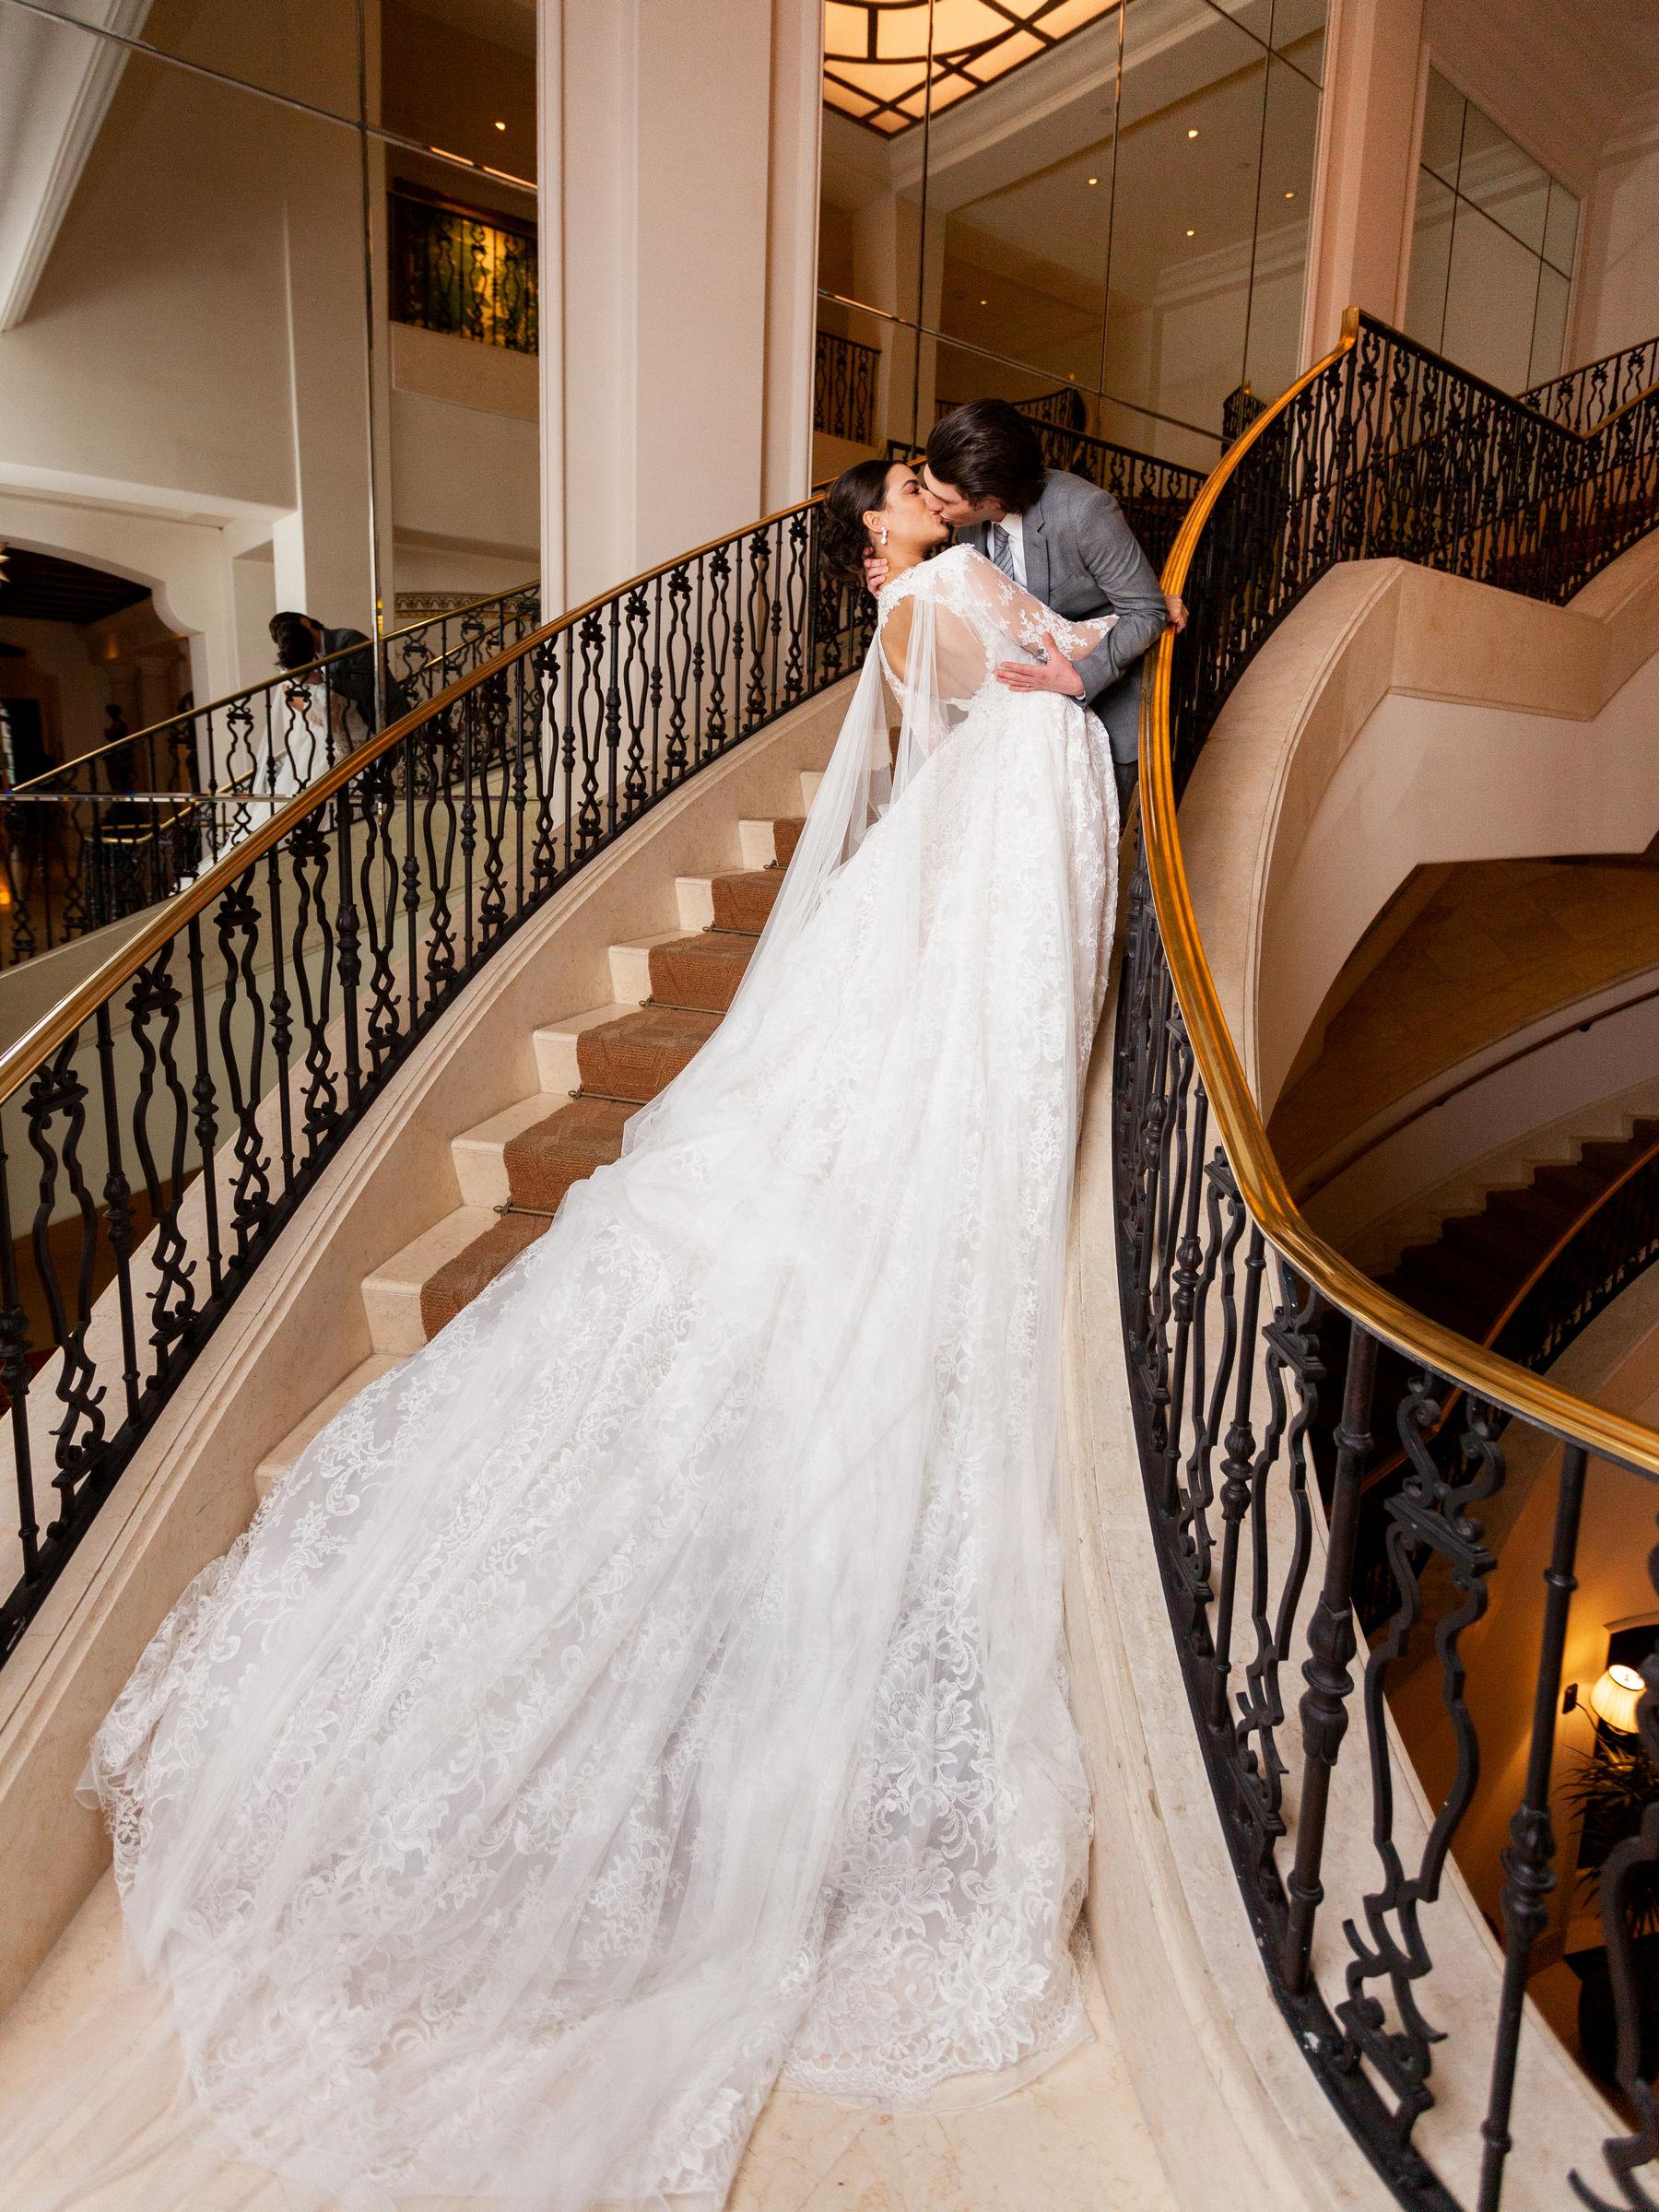 maria-eduardo-montage-beverly-hills-wedding-182.jpg